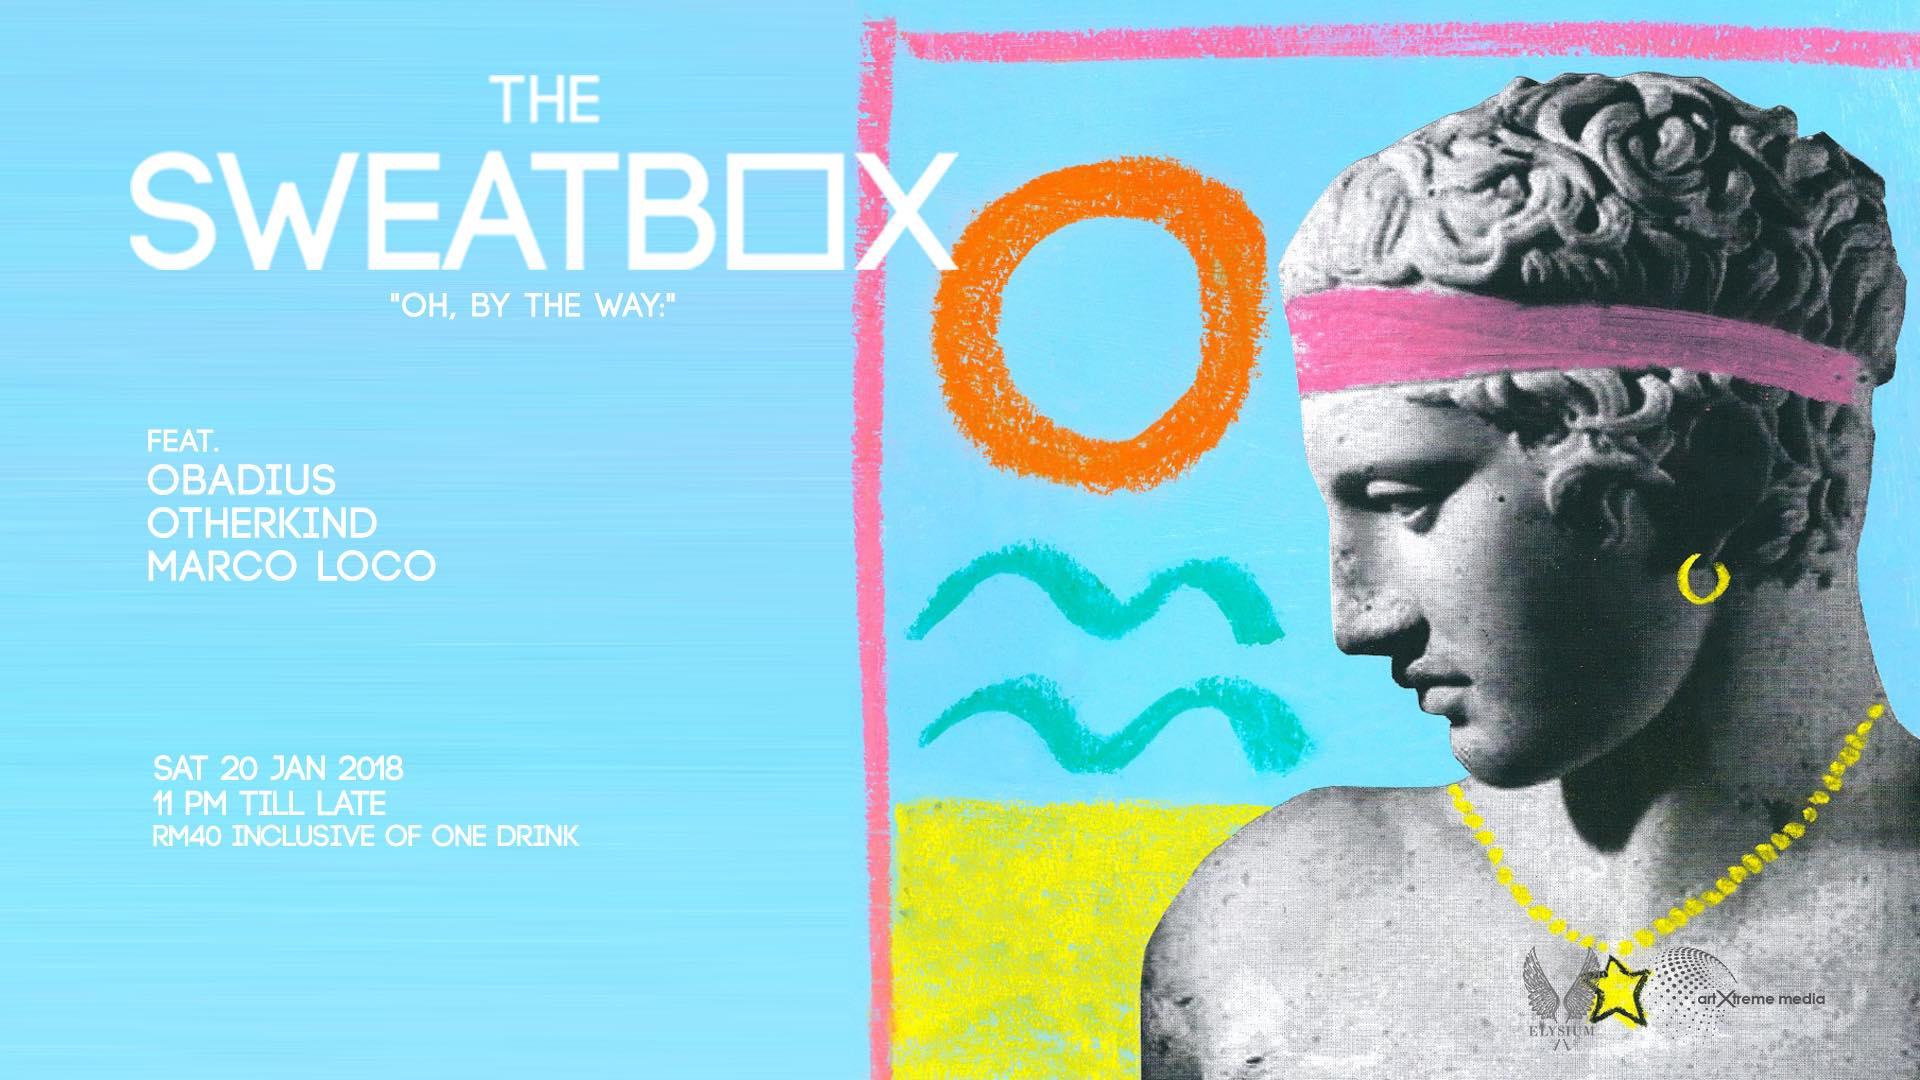 Marco Loco Sweatbox Jan 20 2018